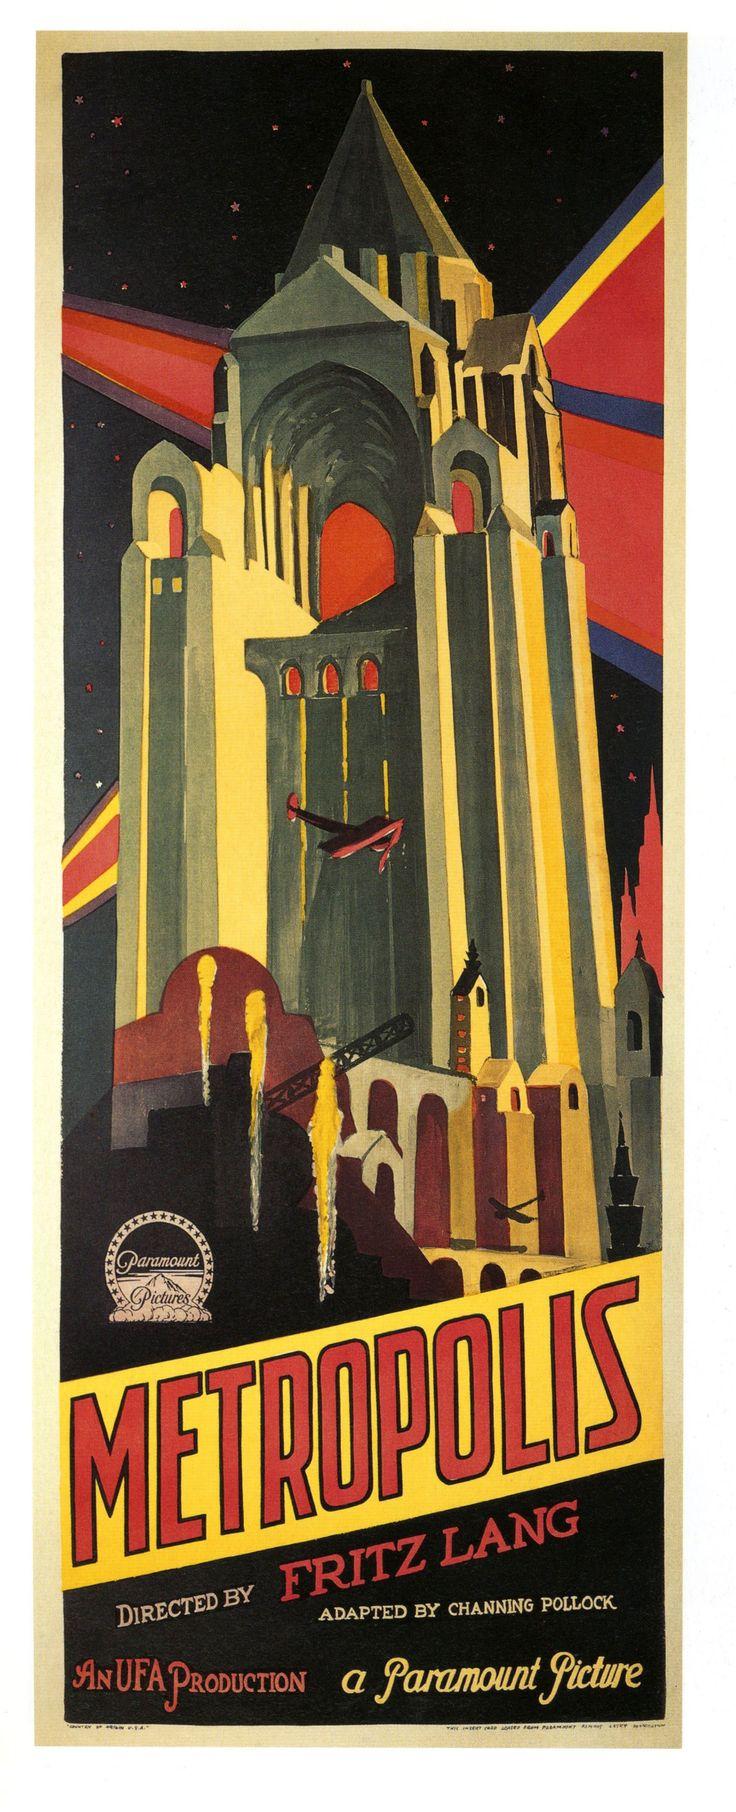 Metropolis directed by Fritz Lang, 1927